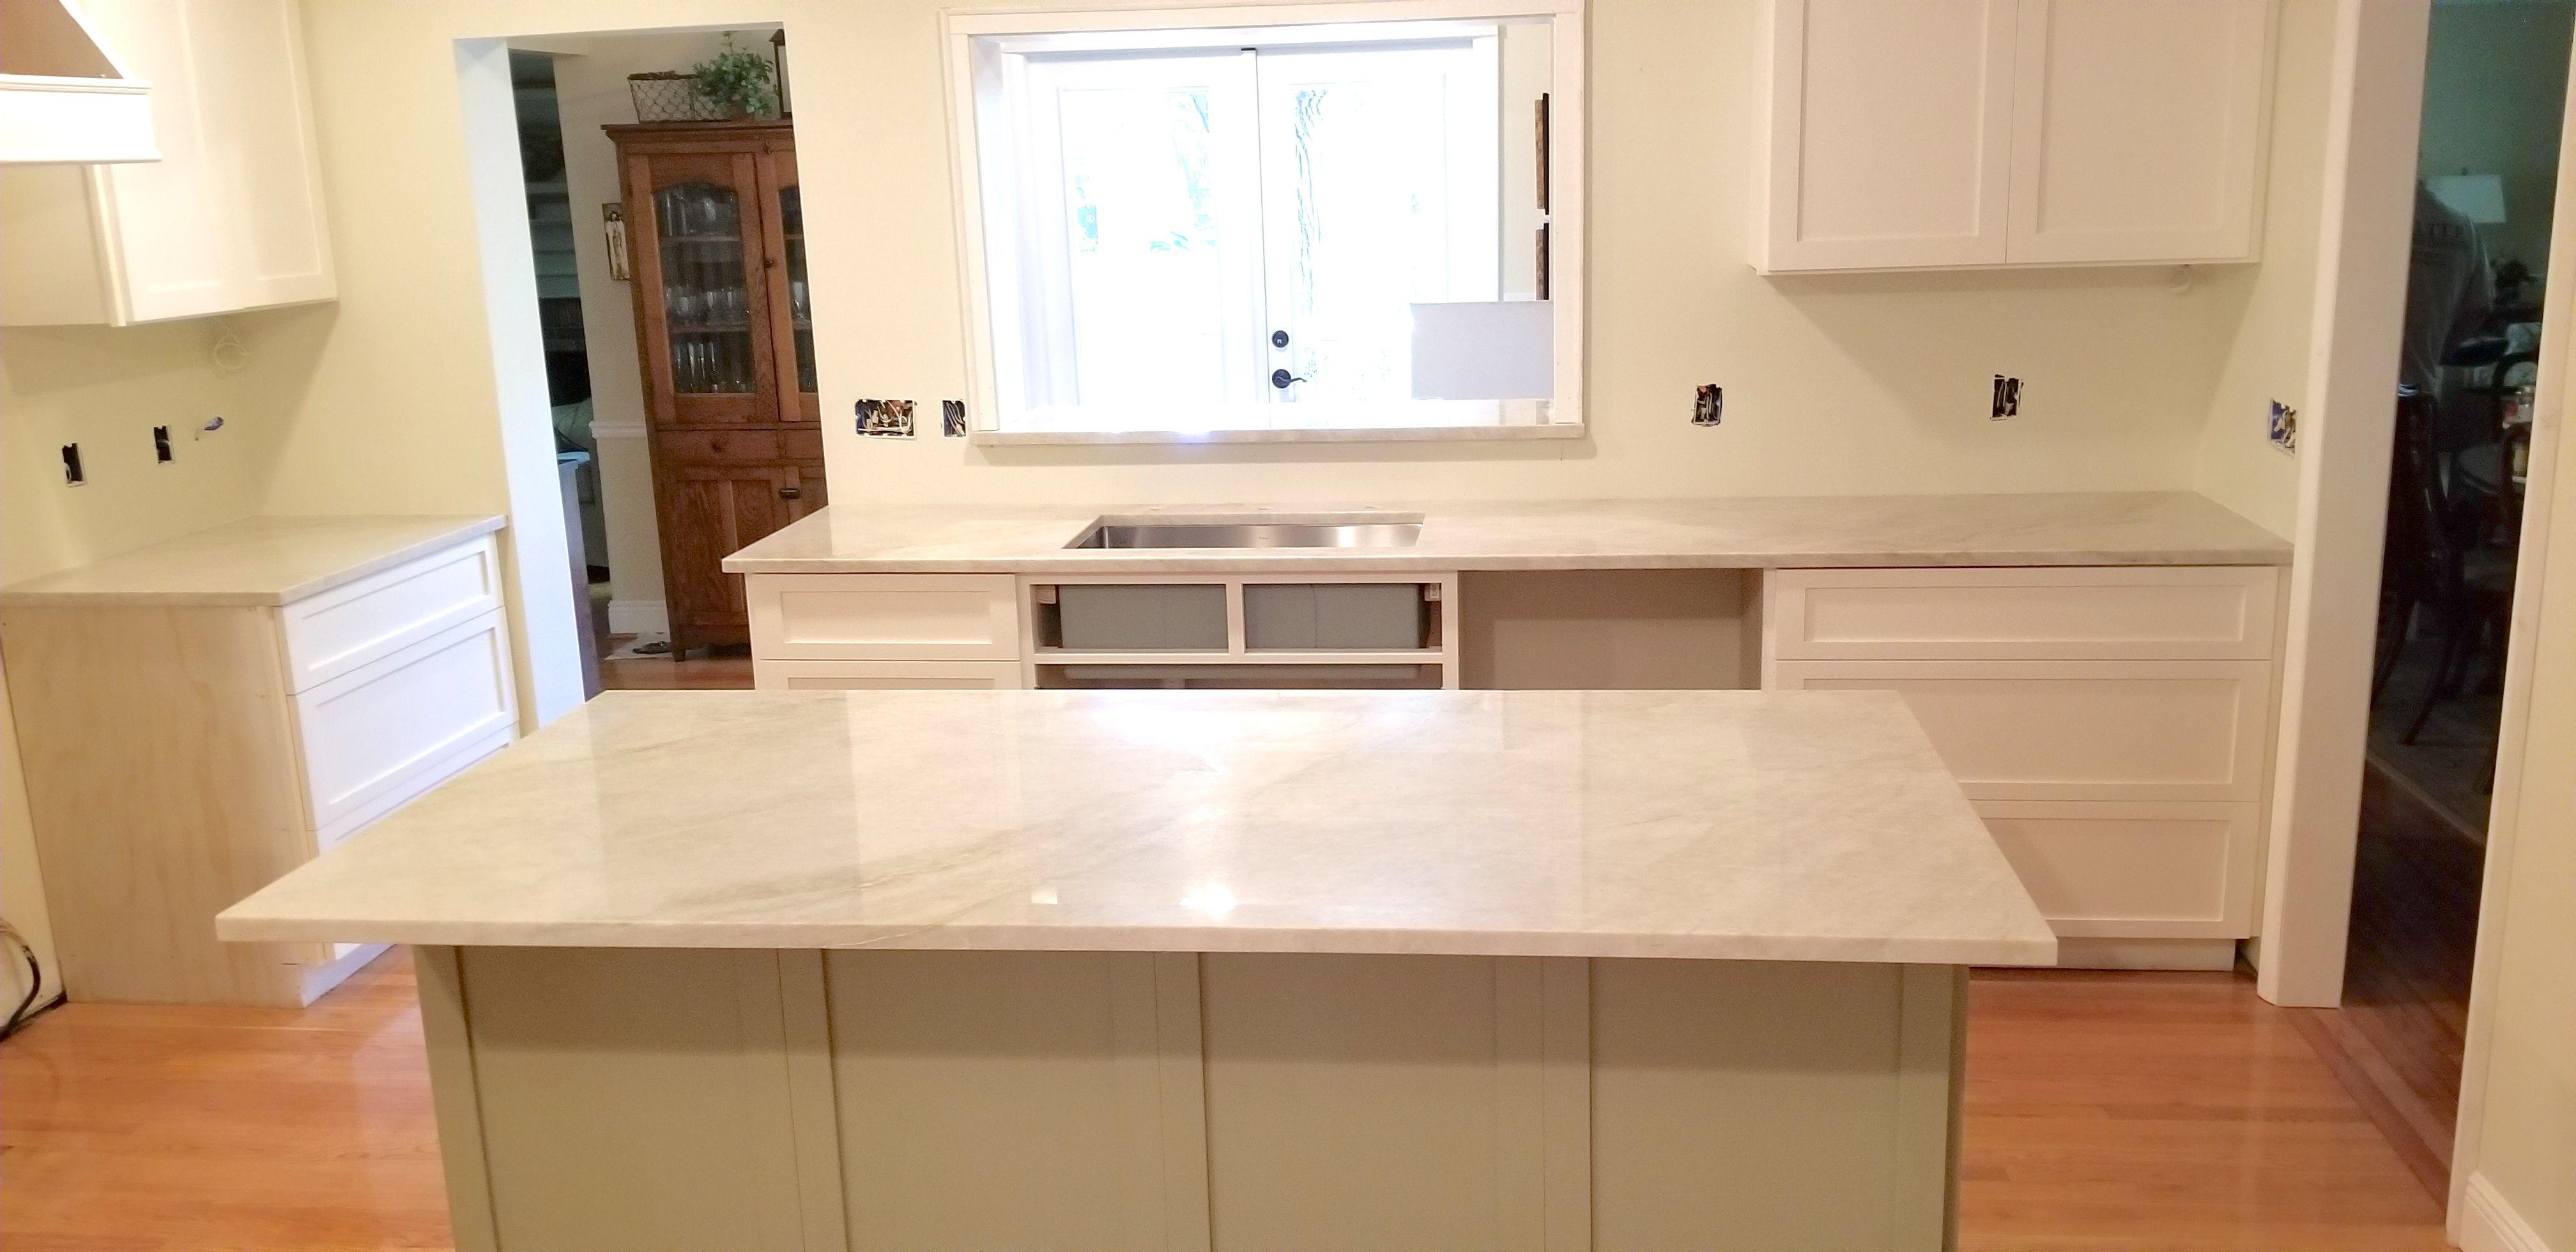 Beautiful Kitchen Island Countertop Using Astonishing Venatino Phoenix Quartz Designed Polished A Kitchen Island Countertop Island Countertops Countertops